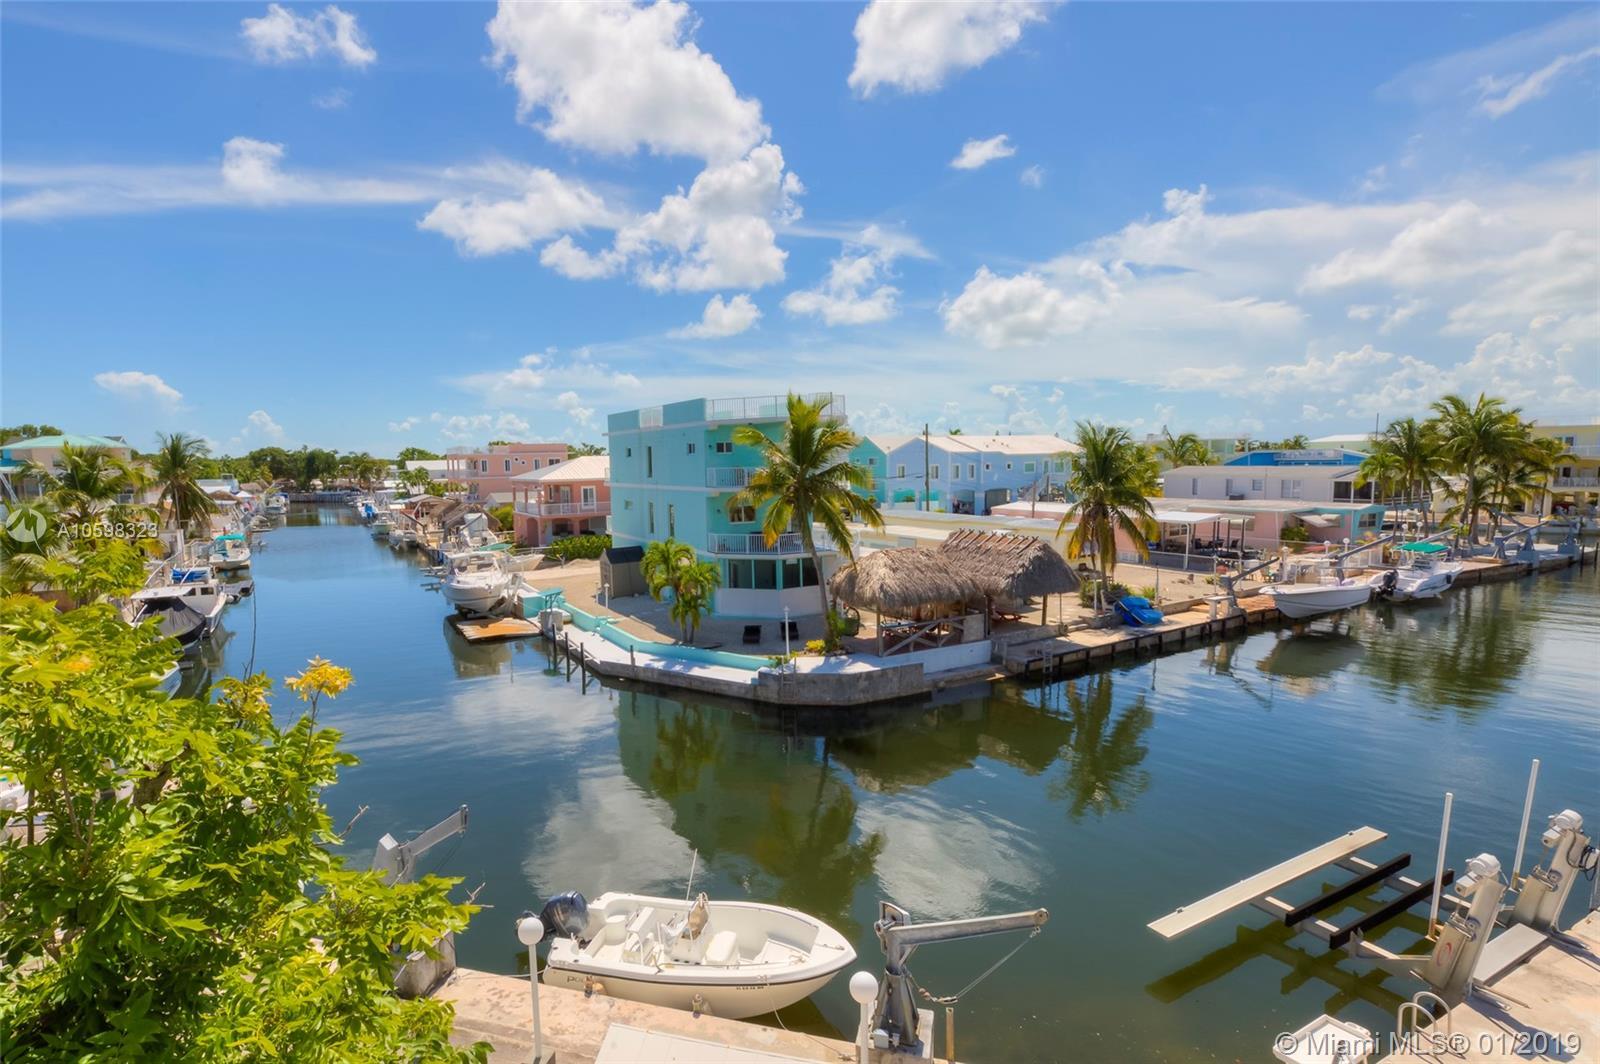 1642 Churchill Downs, Other City - Keys/Islands/Caribb, FL 33037 - Other City - Keys/Islands/Caribb, FL real estate listing